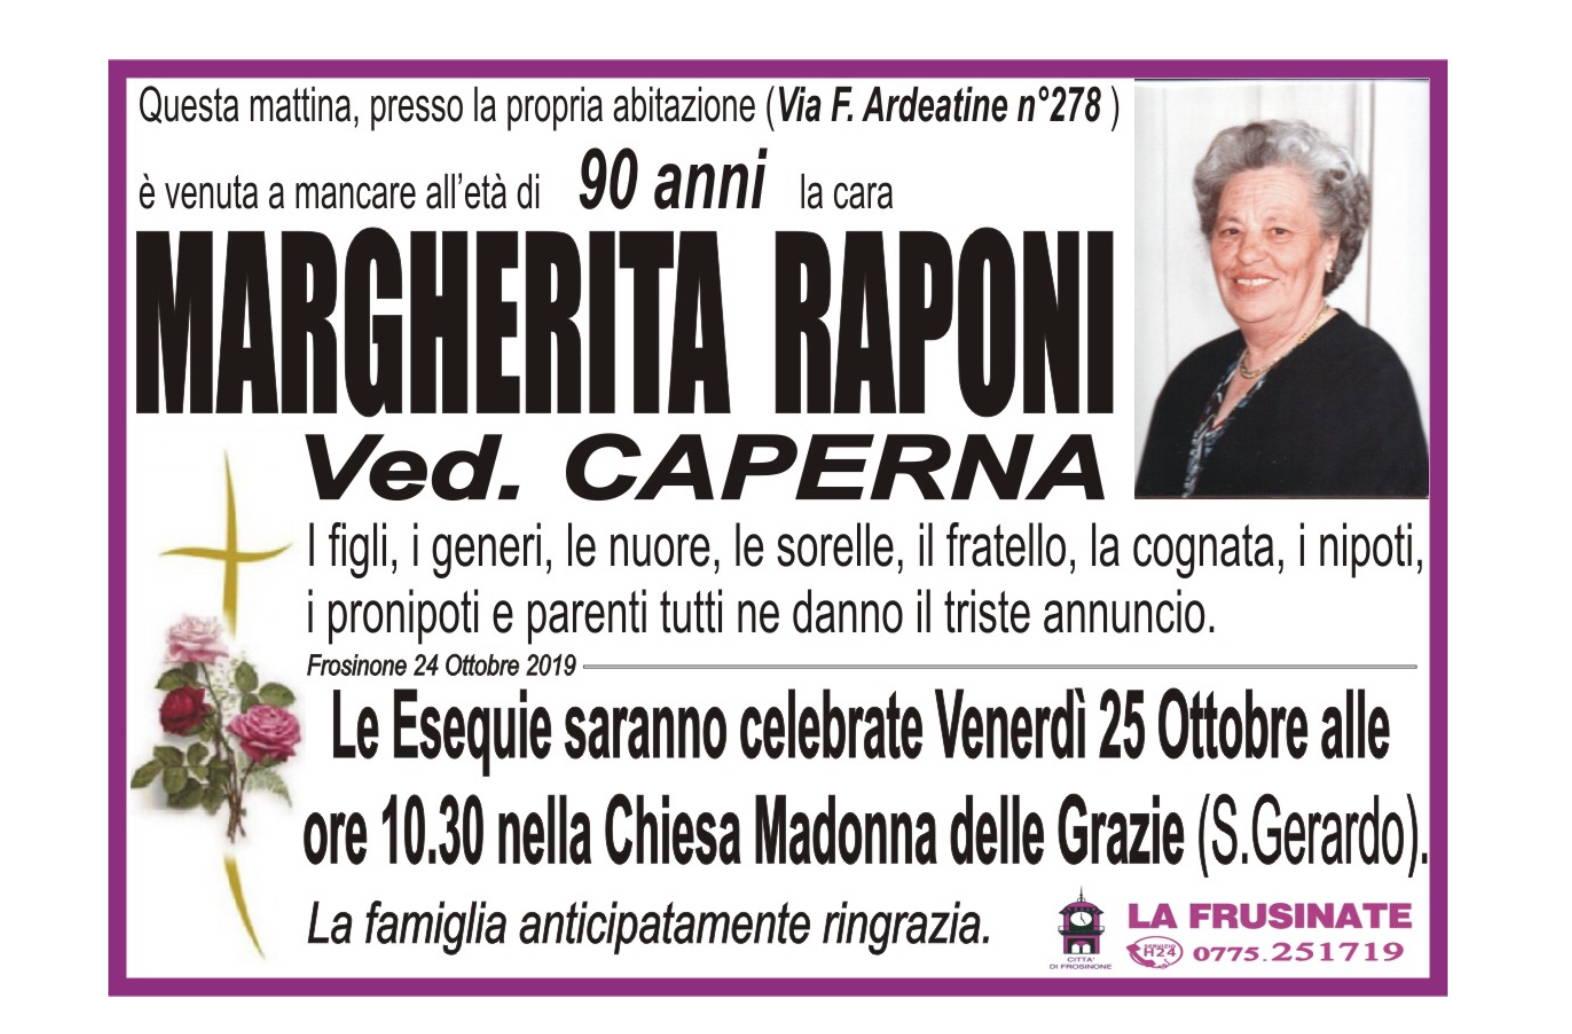 Maria Raponi